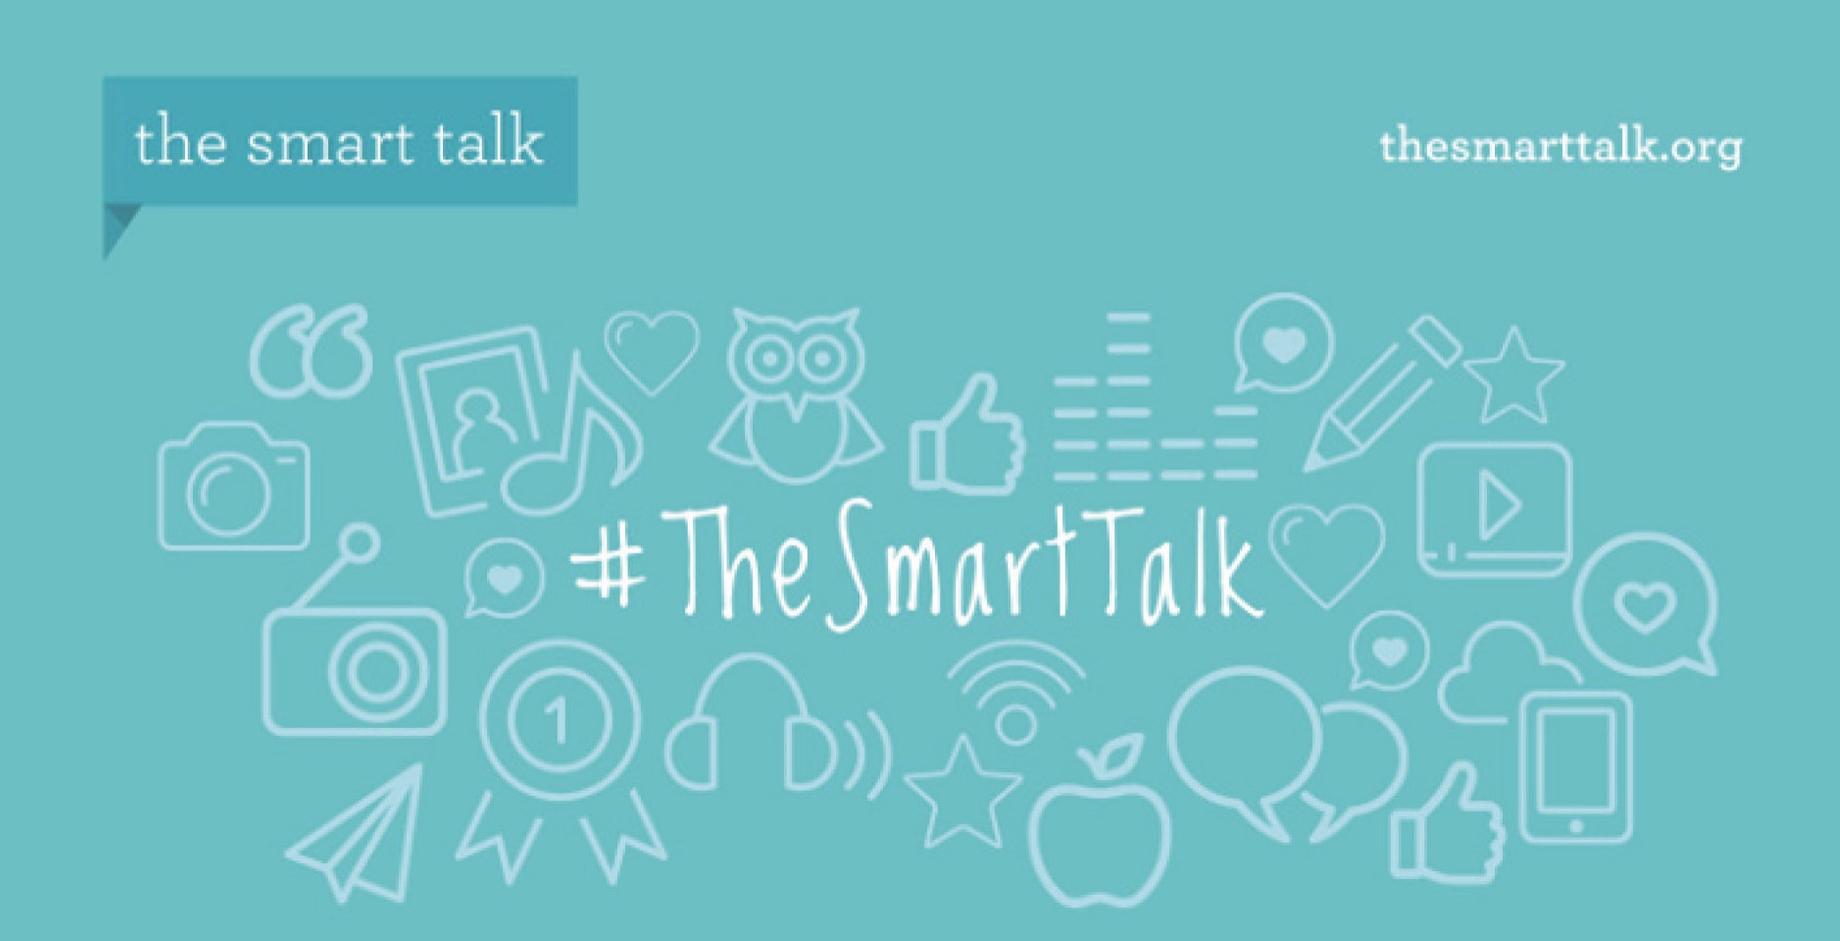 Smarttalk outlook-12 jobs